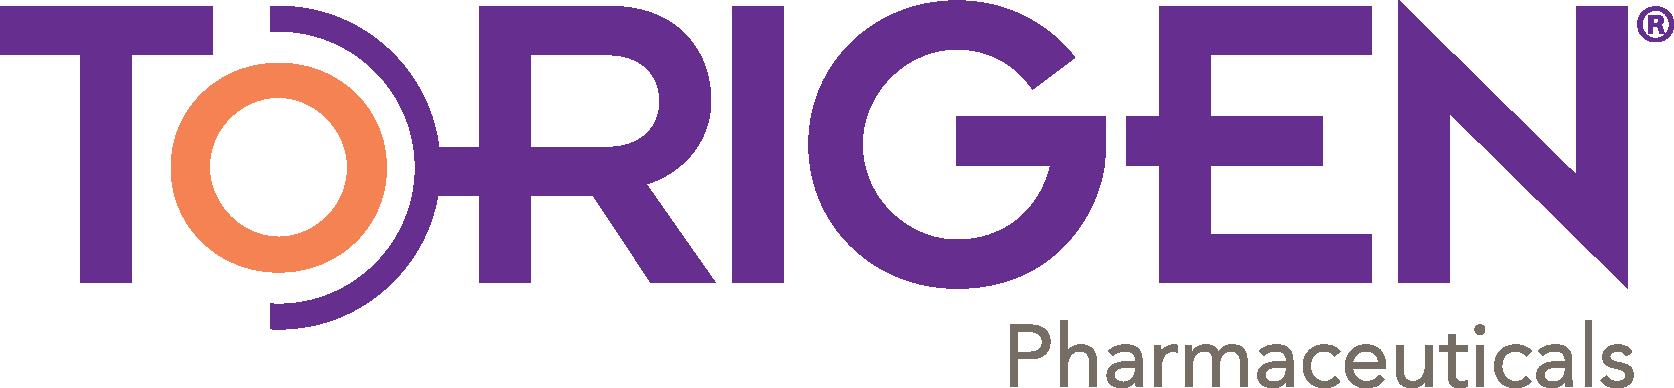 TorigenPharm Logo CMYK (3).png